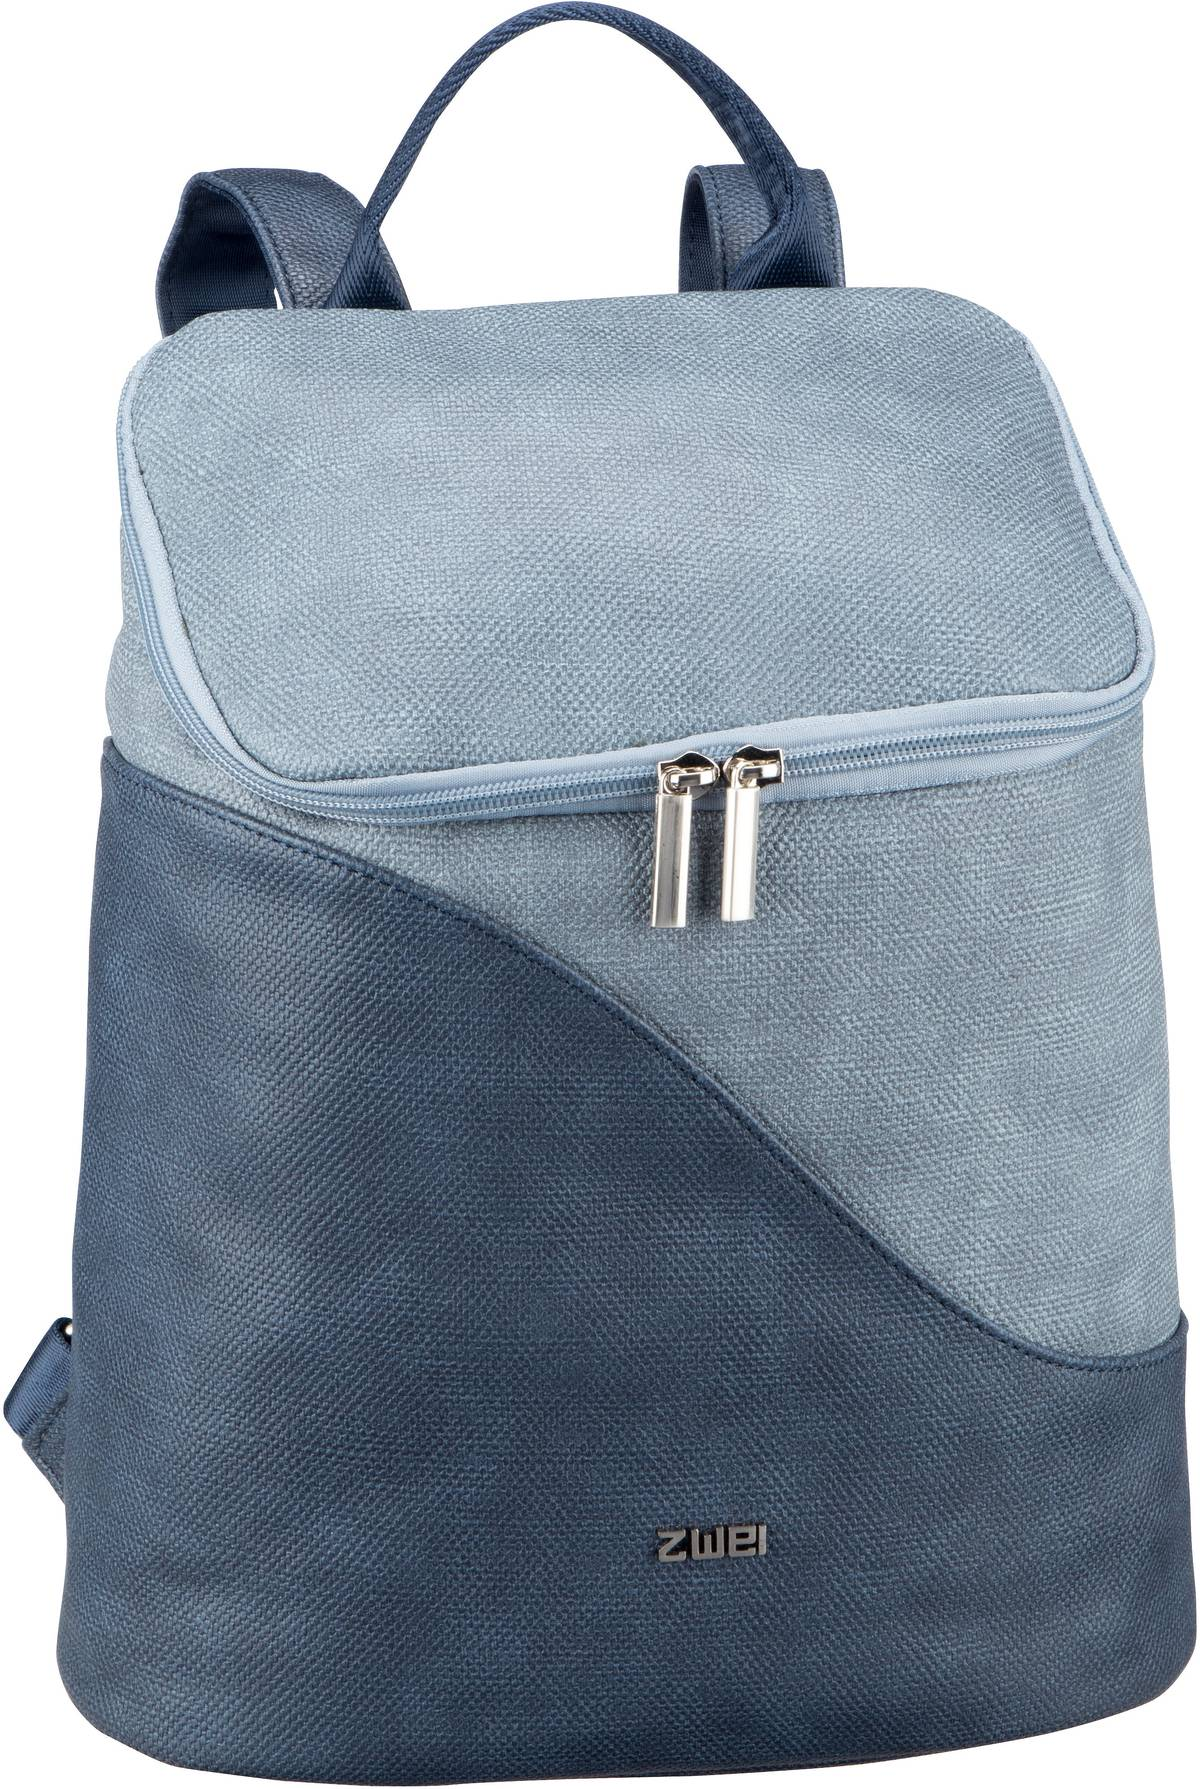 Rucksack / Daypack Cherie CHR11 Canvas/Blue (7 Liter)